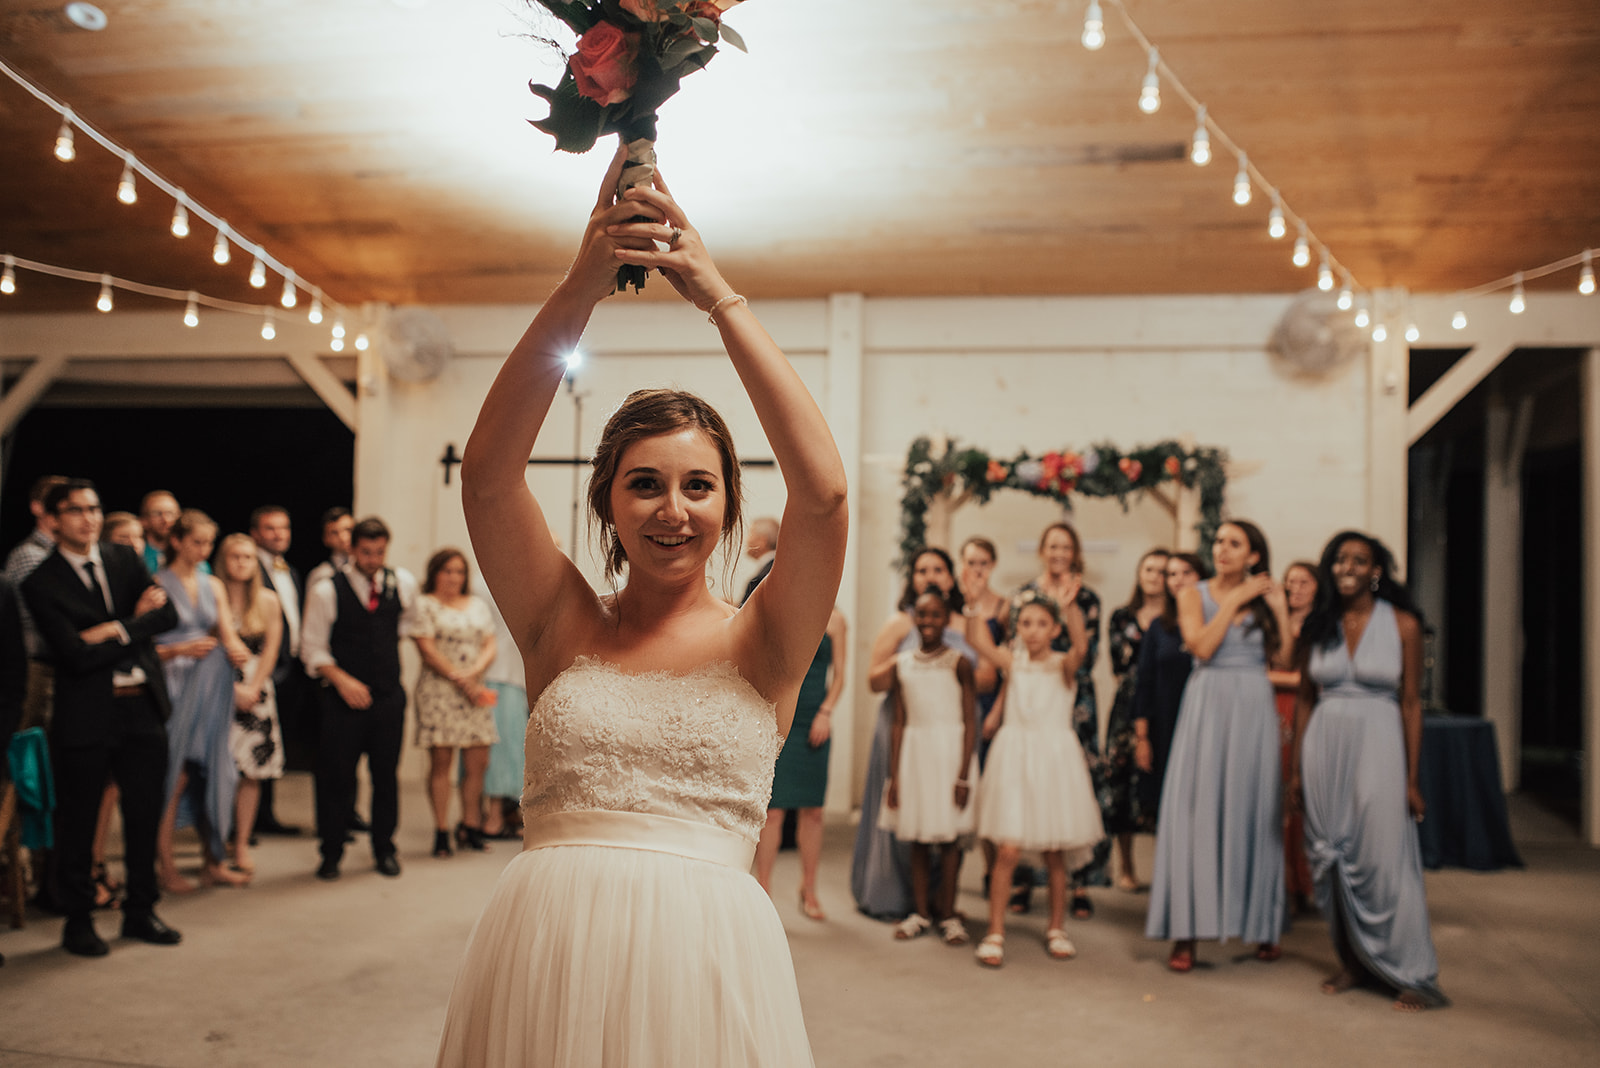 Richmond Wedding By SB Photographs5151510510051.jpg